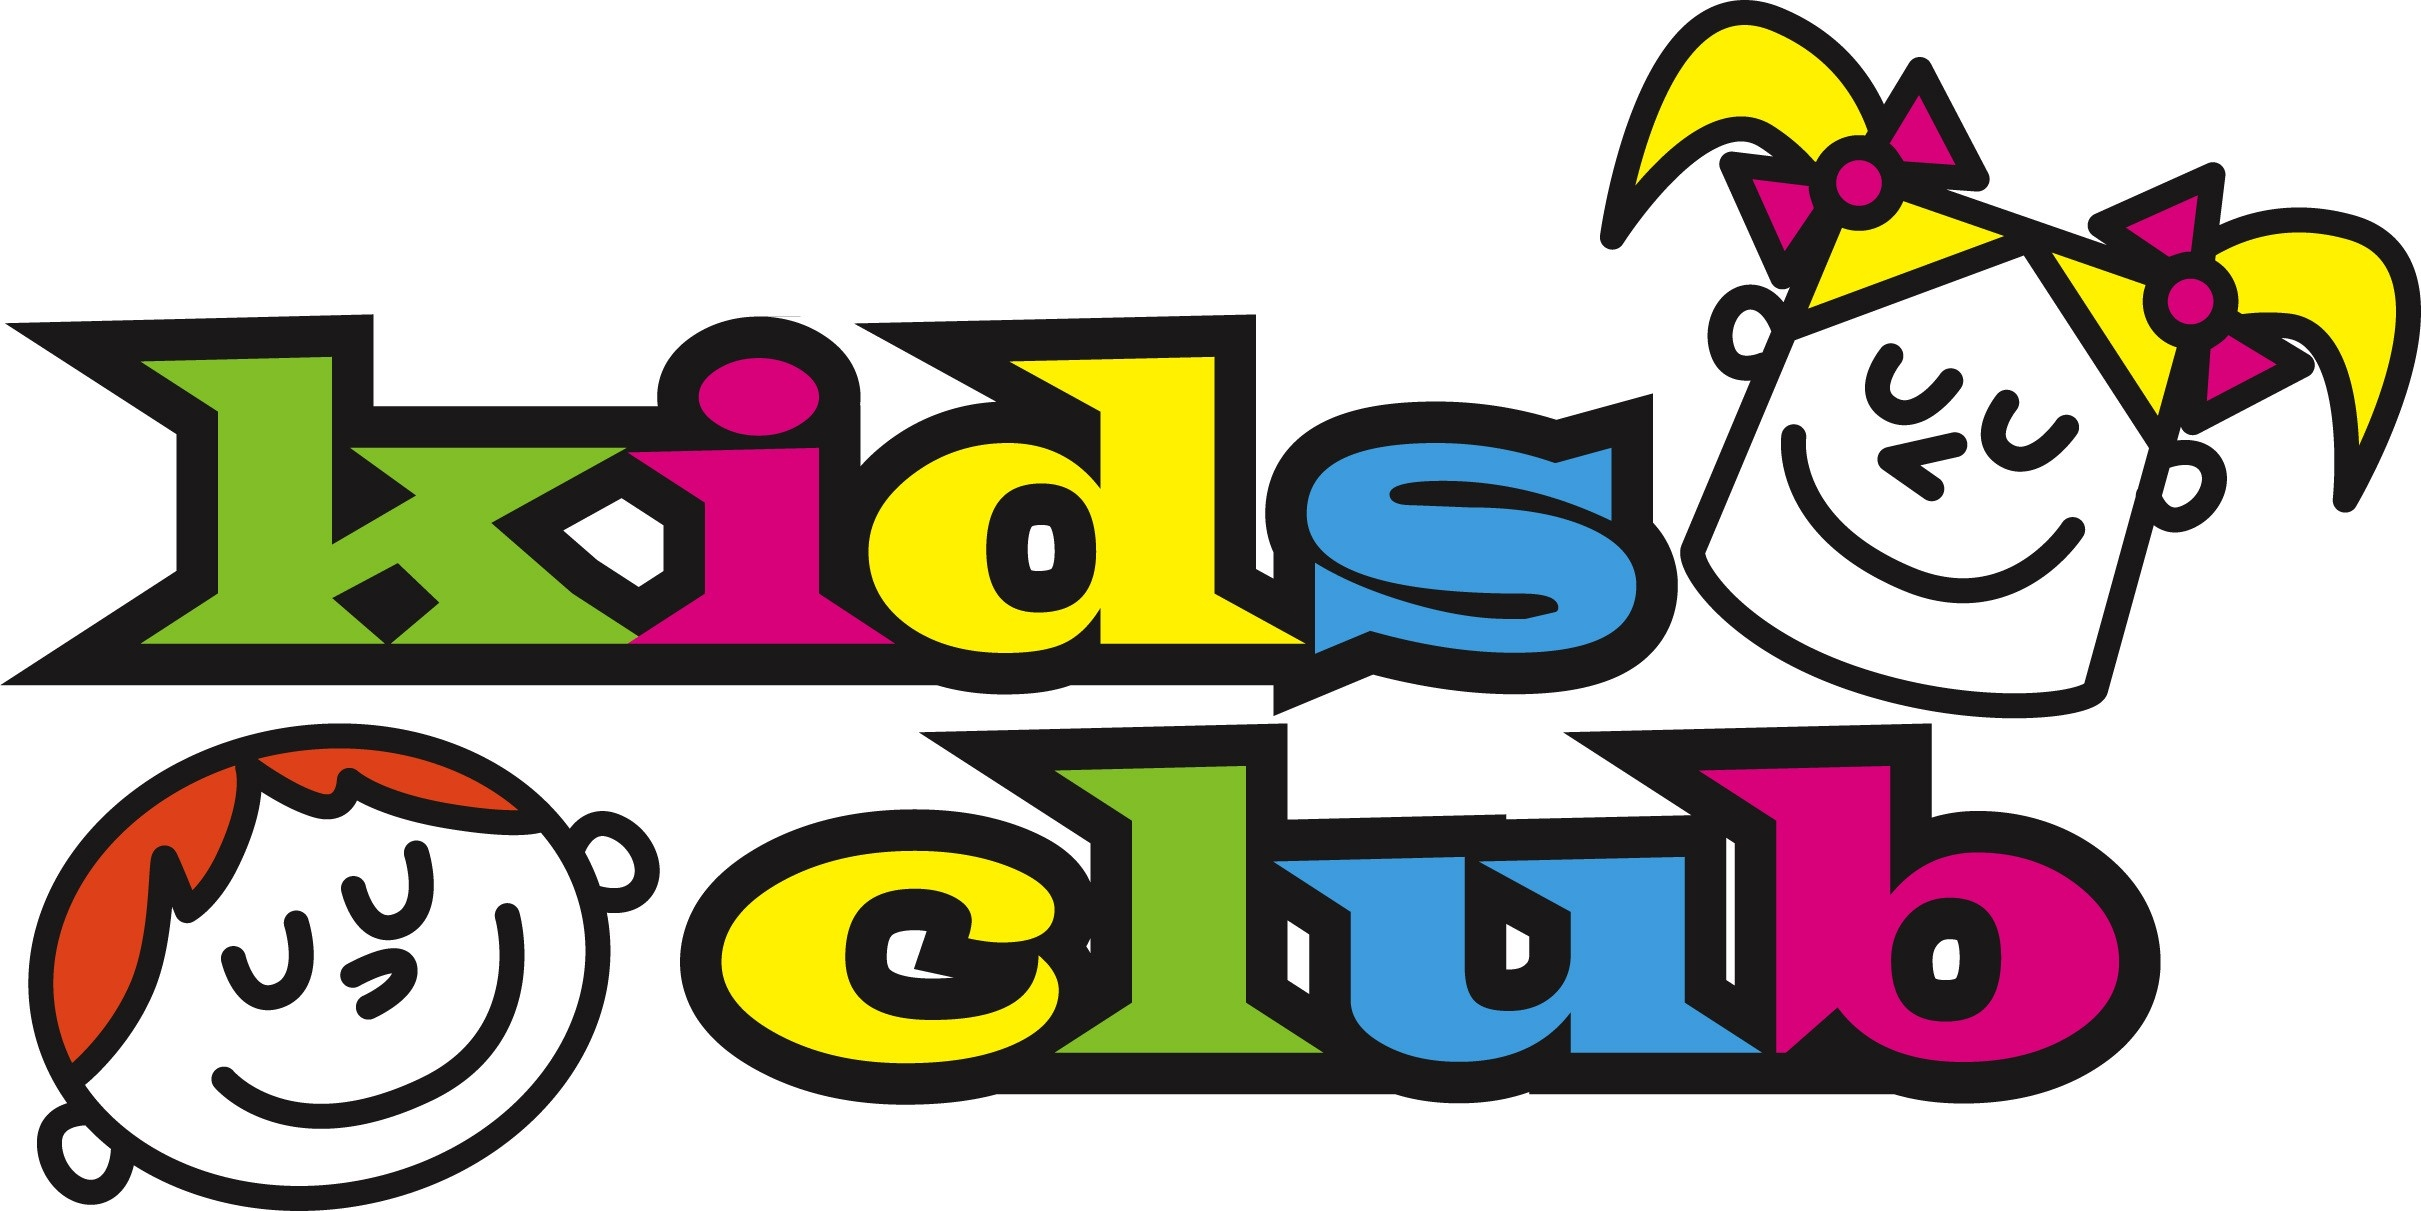 Kids clubs clipart.